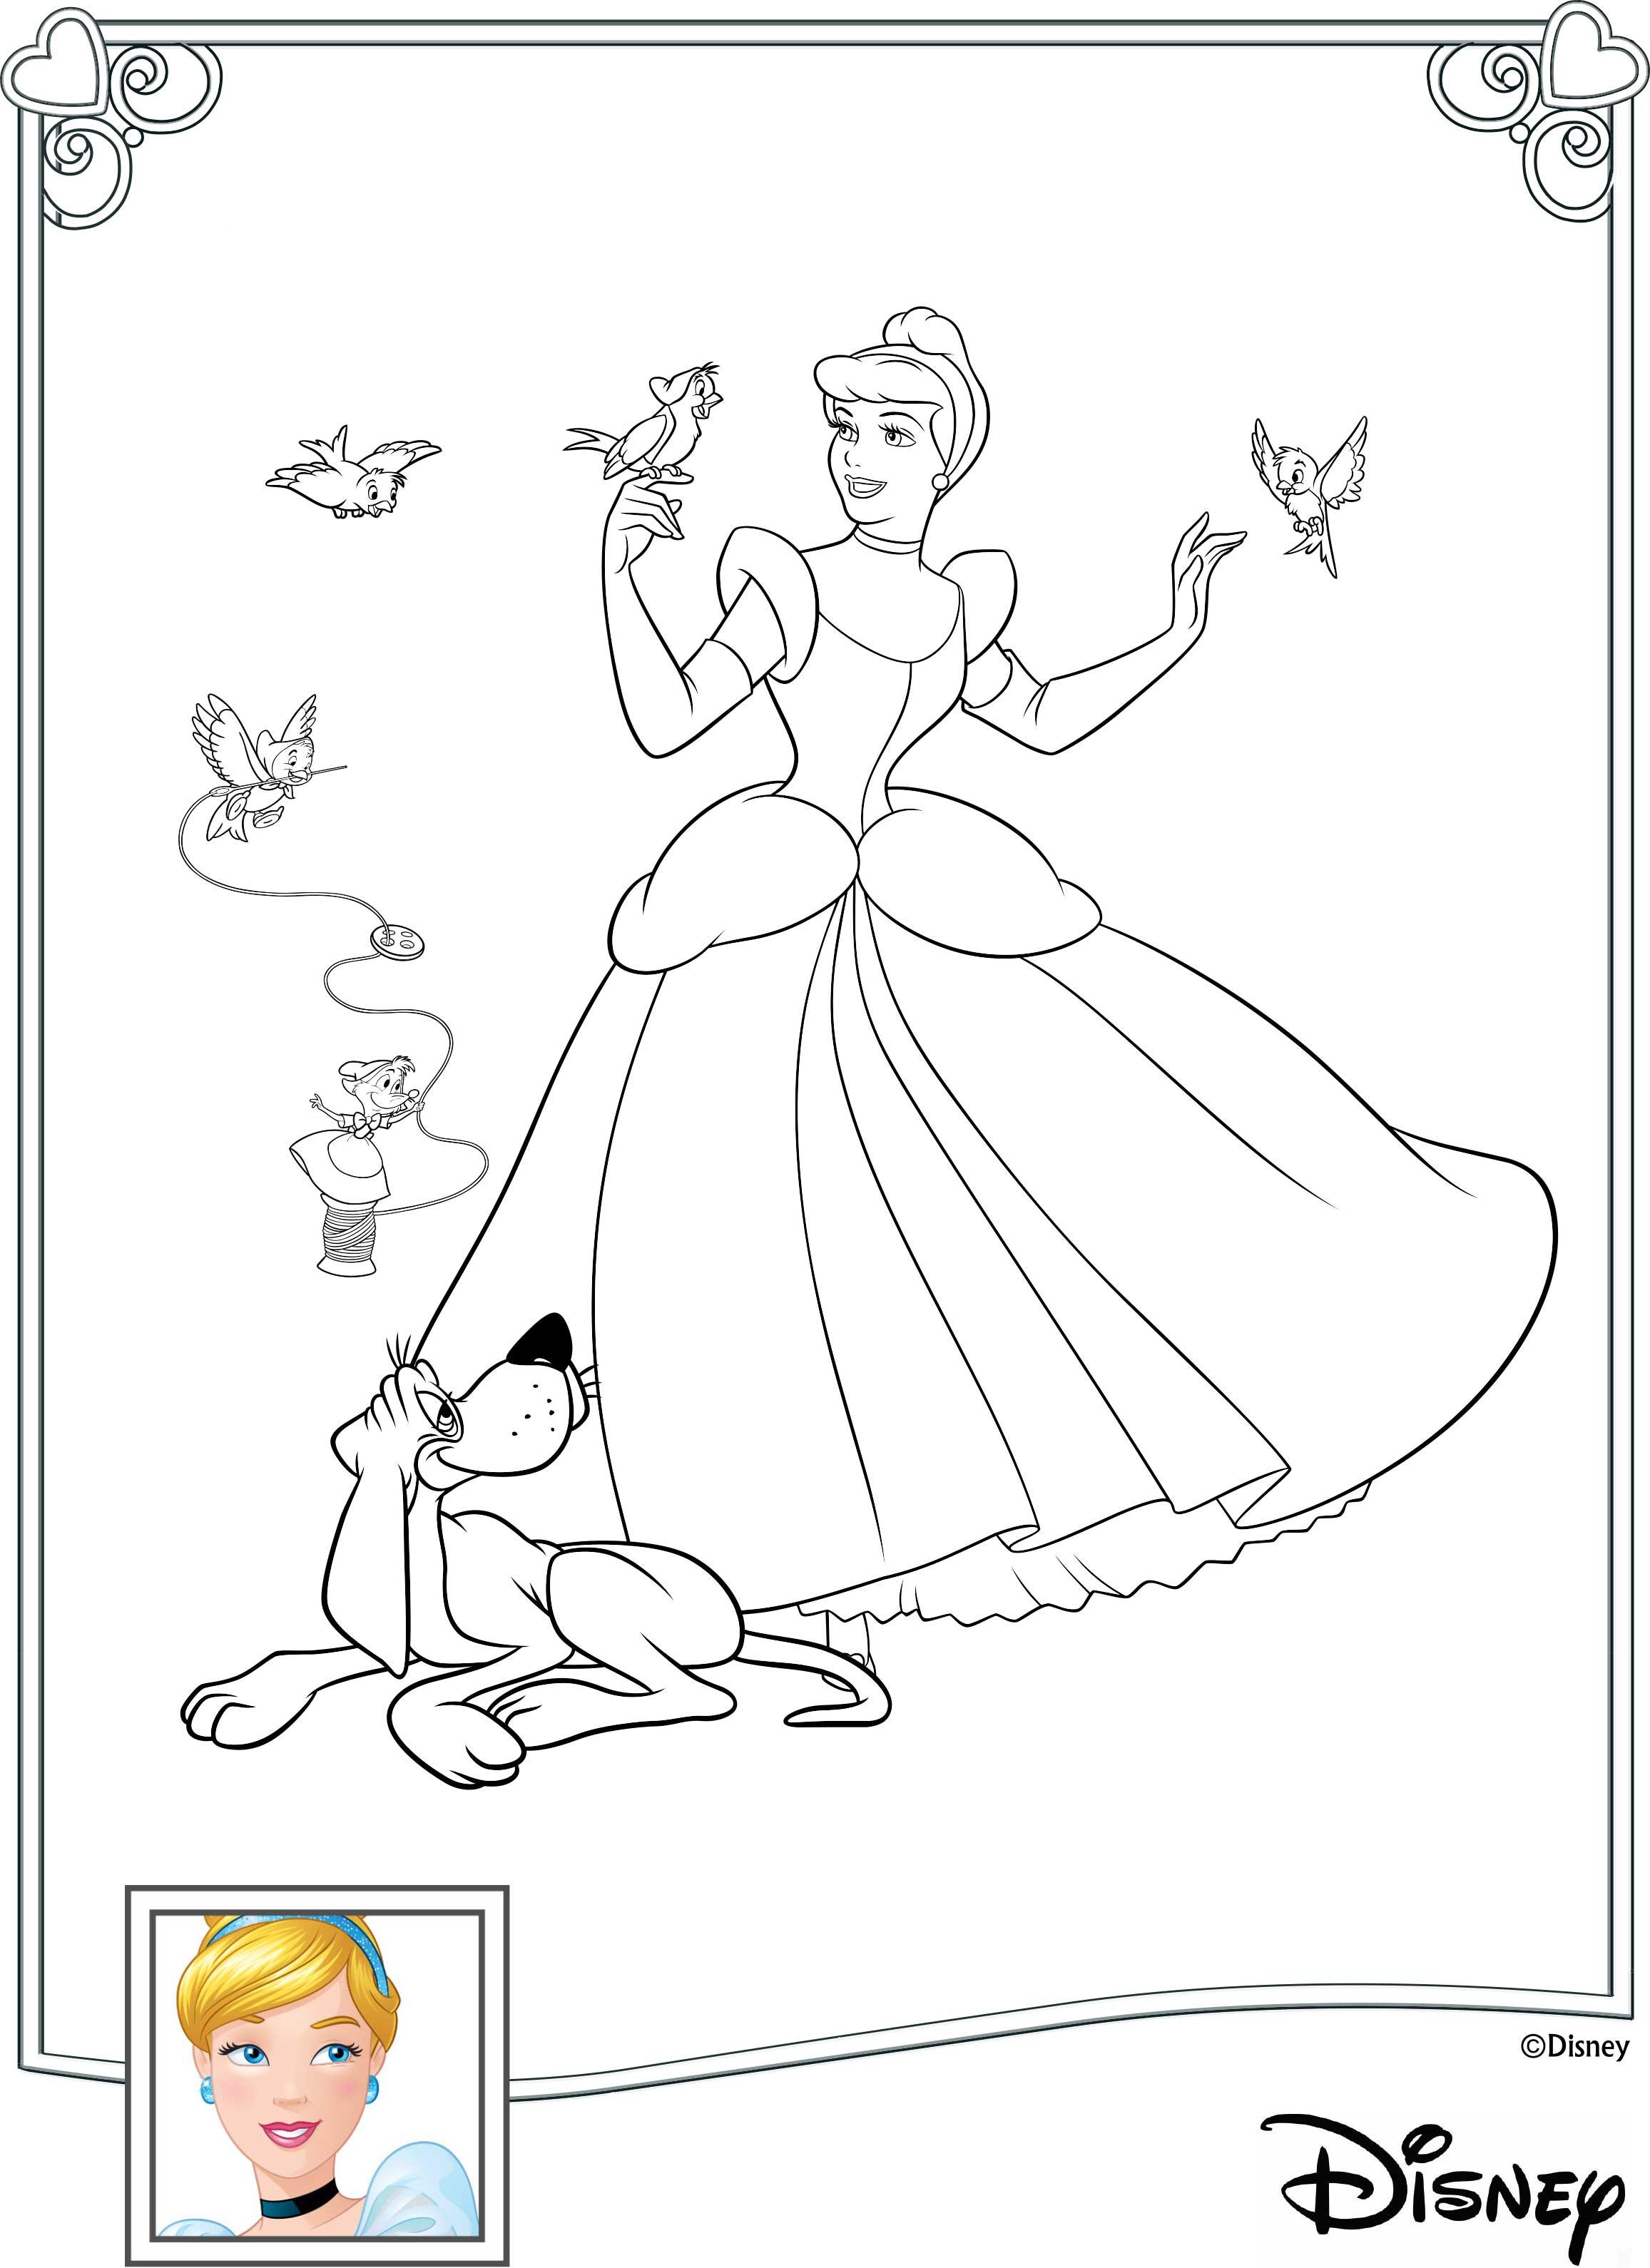 disney princess interactive coloring pages - photo#7